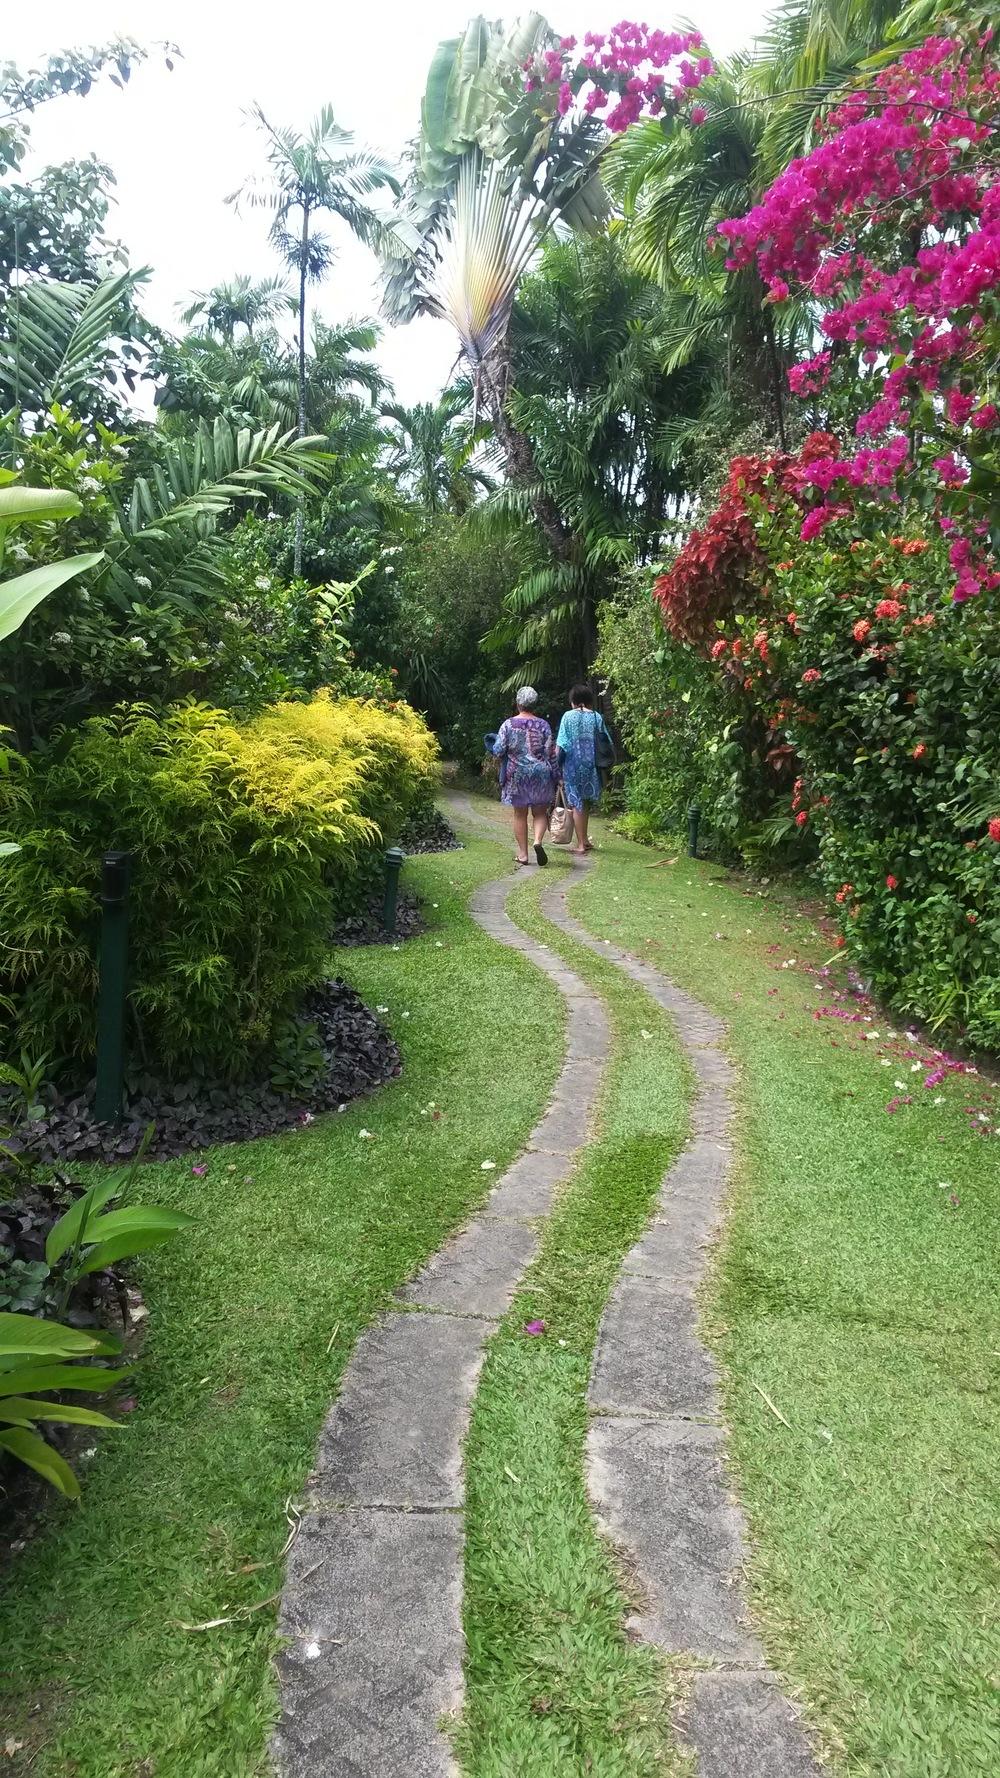 Stroll the garden path